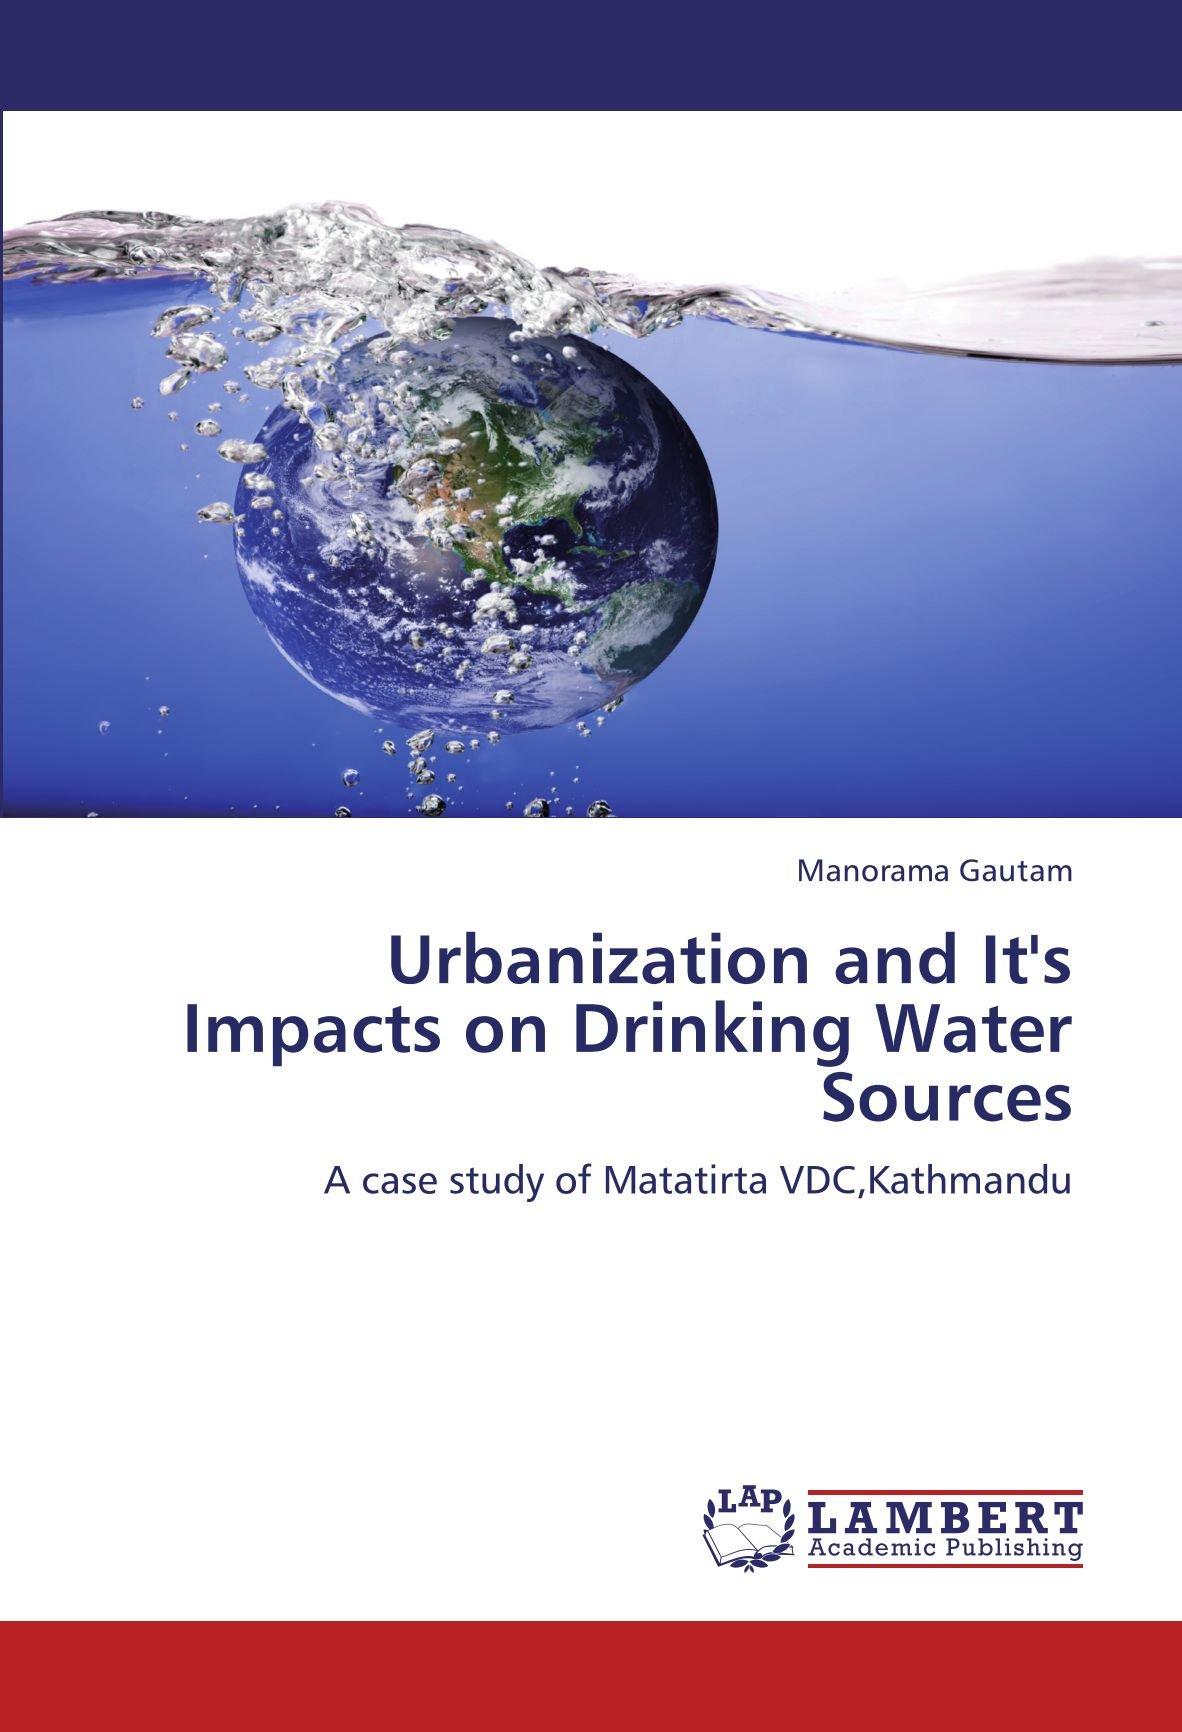 Urbanization and It's Impacts on Drinking Water Sources: A case study of Matatirta VDC,Kathmandu PDF